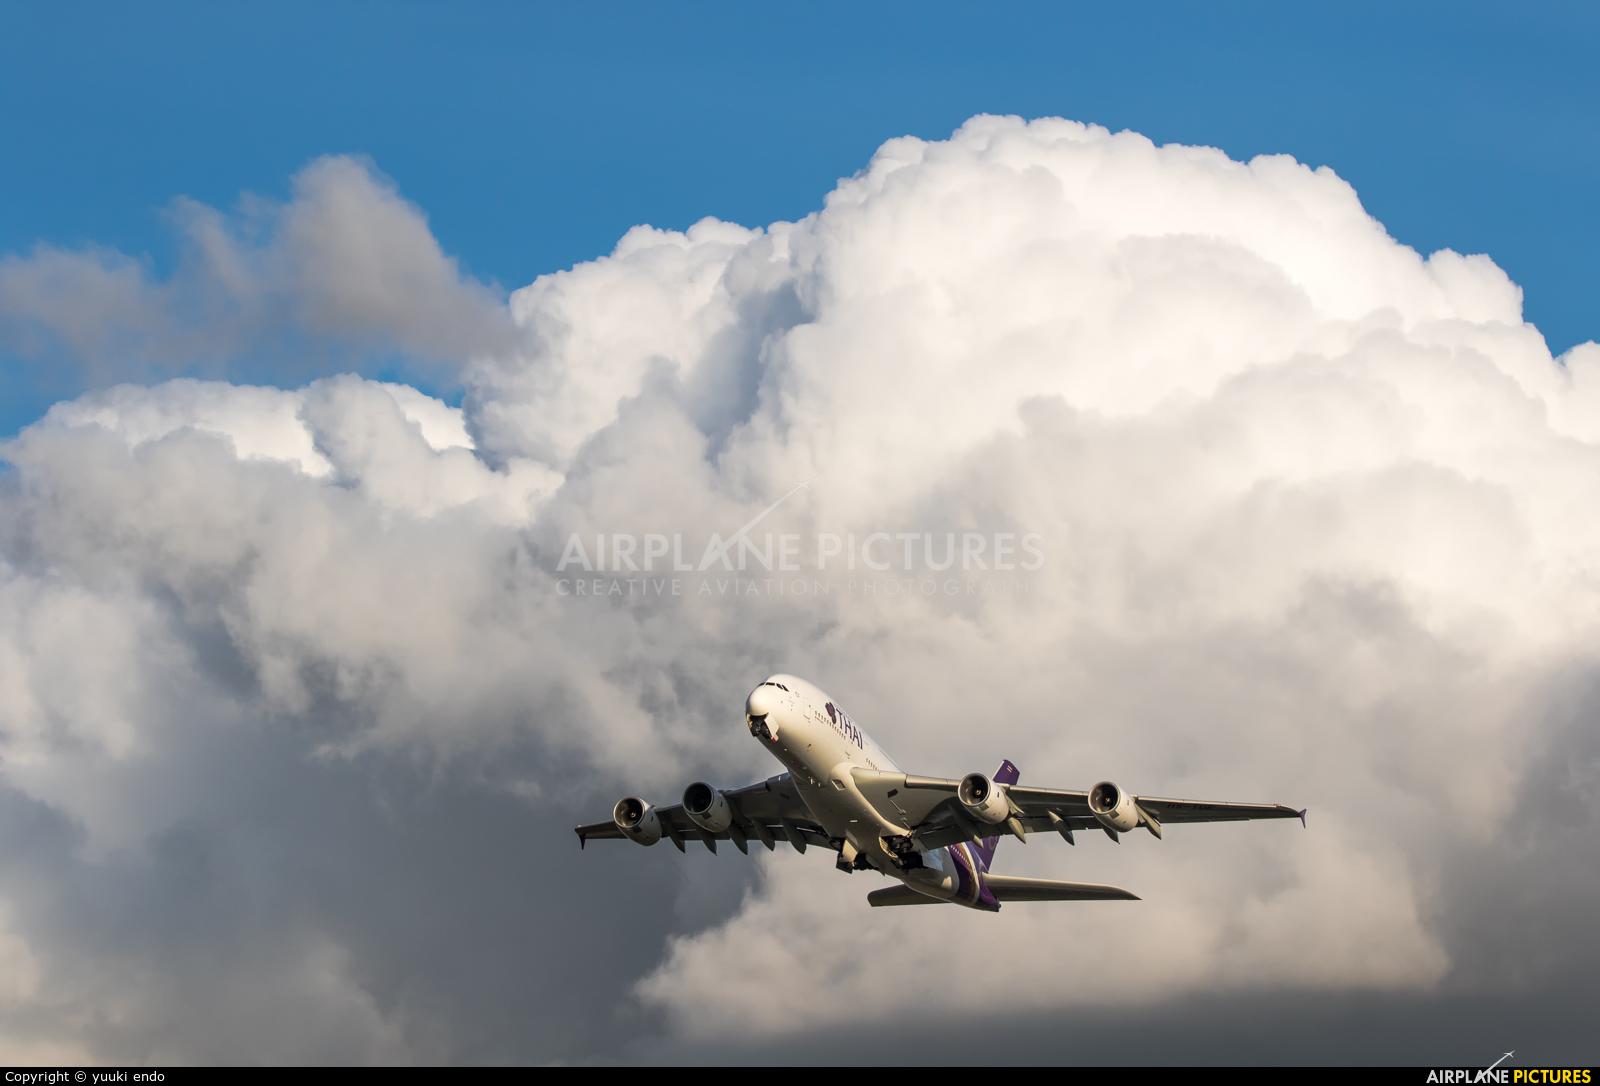 Thai Airways HS-TUE aircraft at Off Airport - Japan